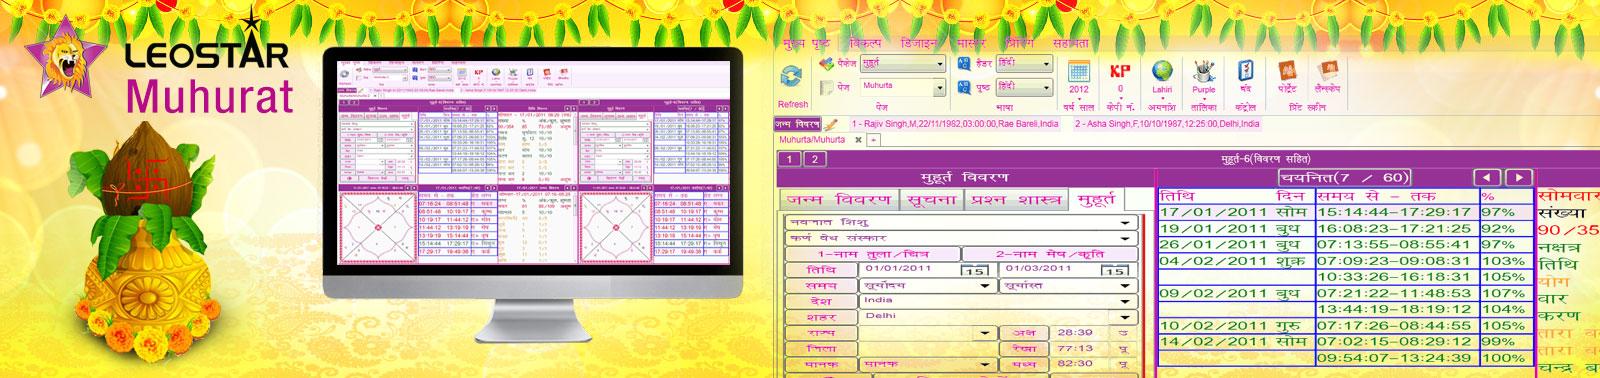 Leostar the best muhurat software